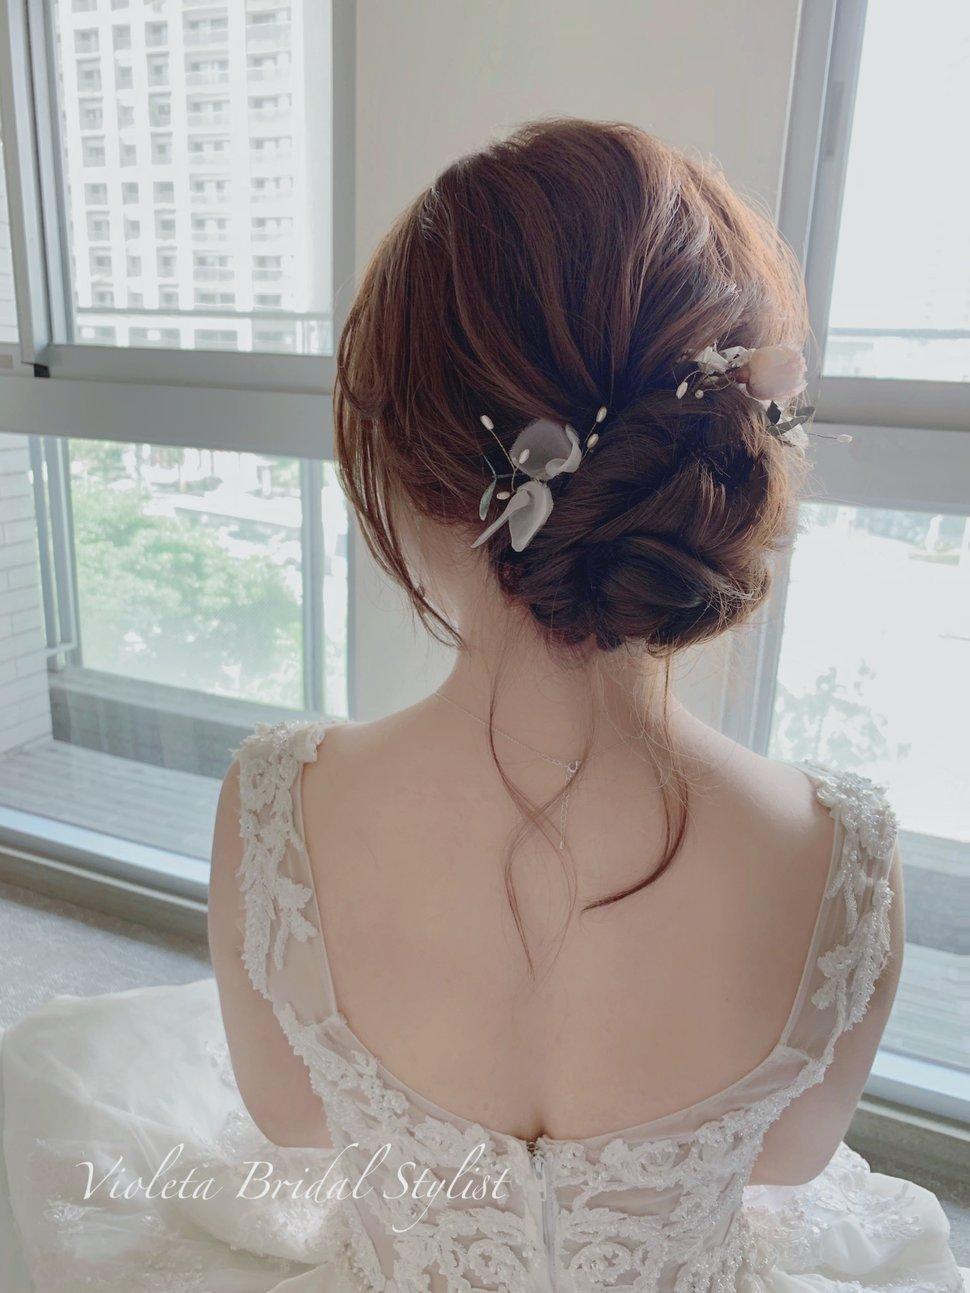 A16998F8-E754-4D8A-ADE9-59D9462AEE64 - 台中/台南新秘可可 新娘精緻彩妝整體造型《結婚吧》